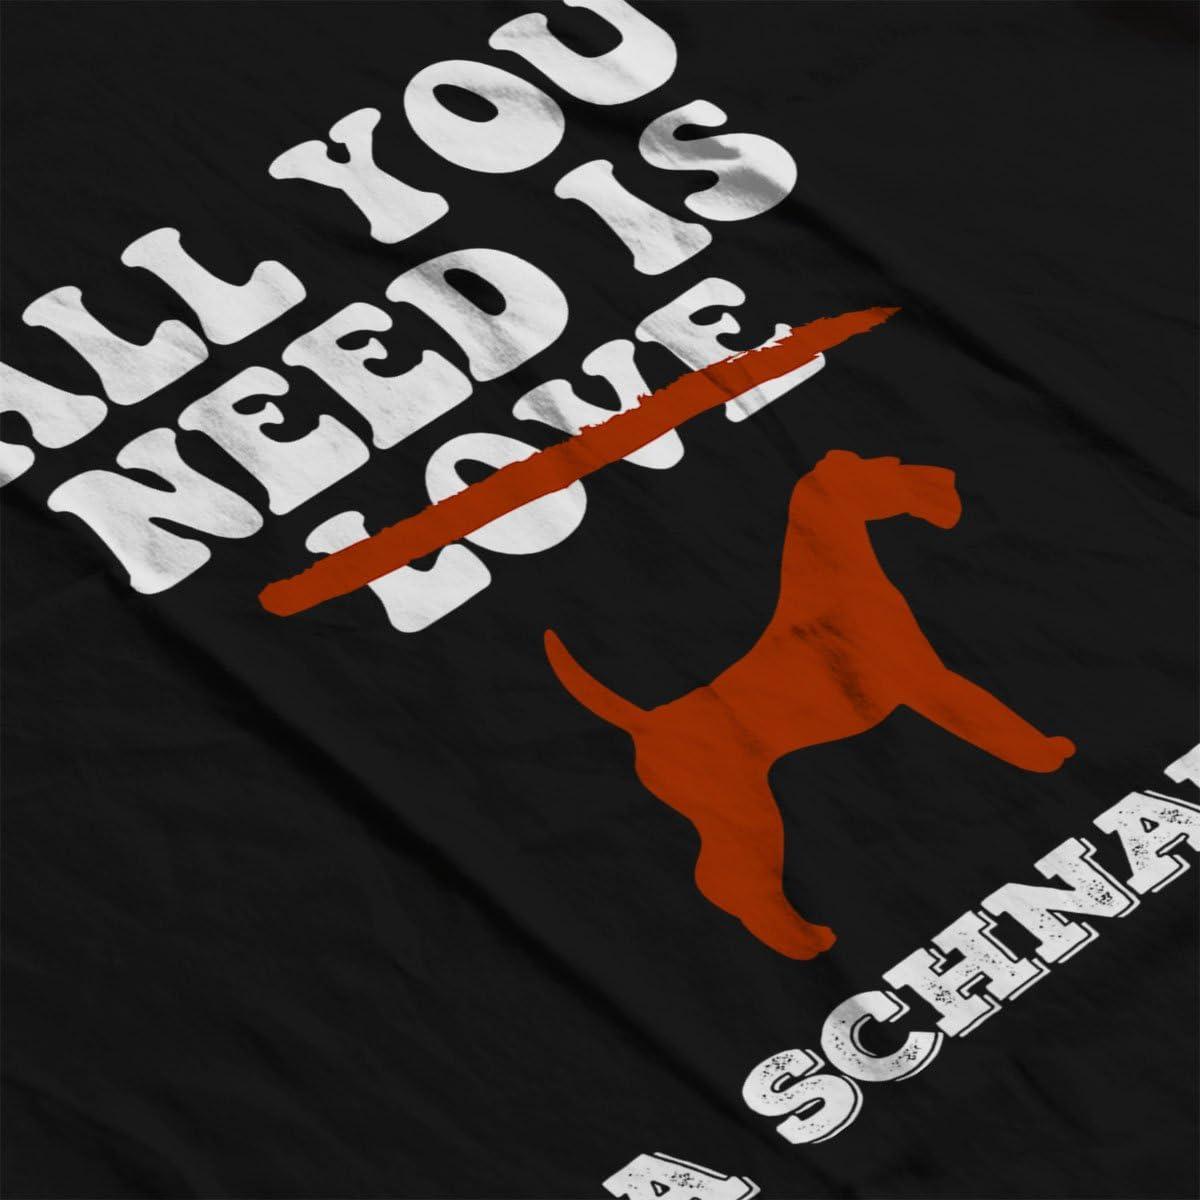 Coto7 All You Need is A Schnauzer Kids Sweatshirt